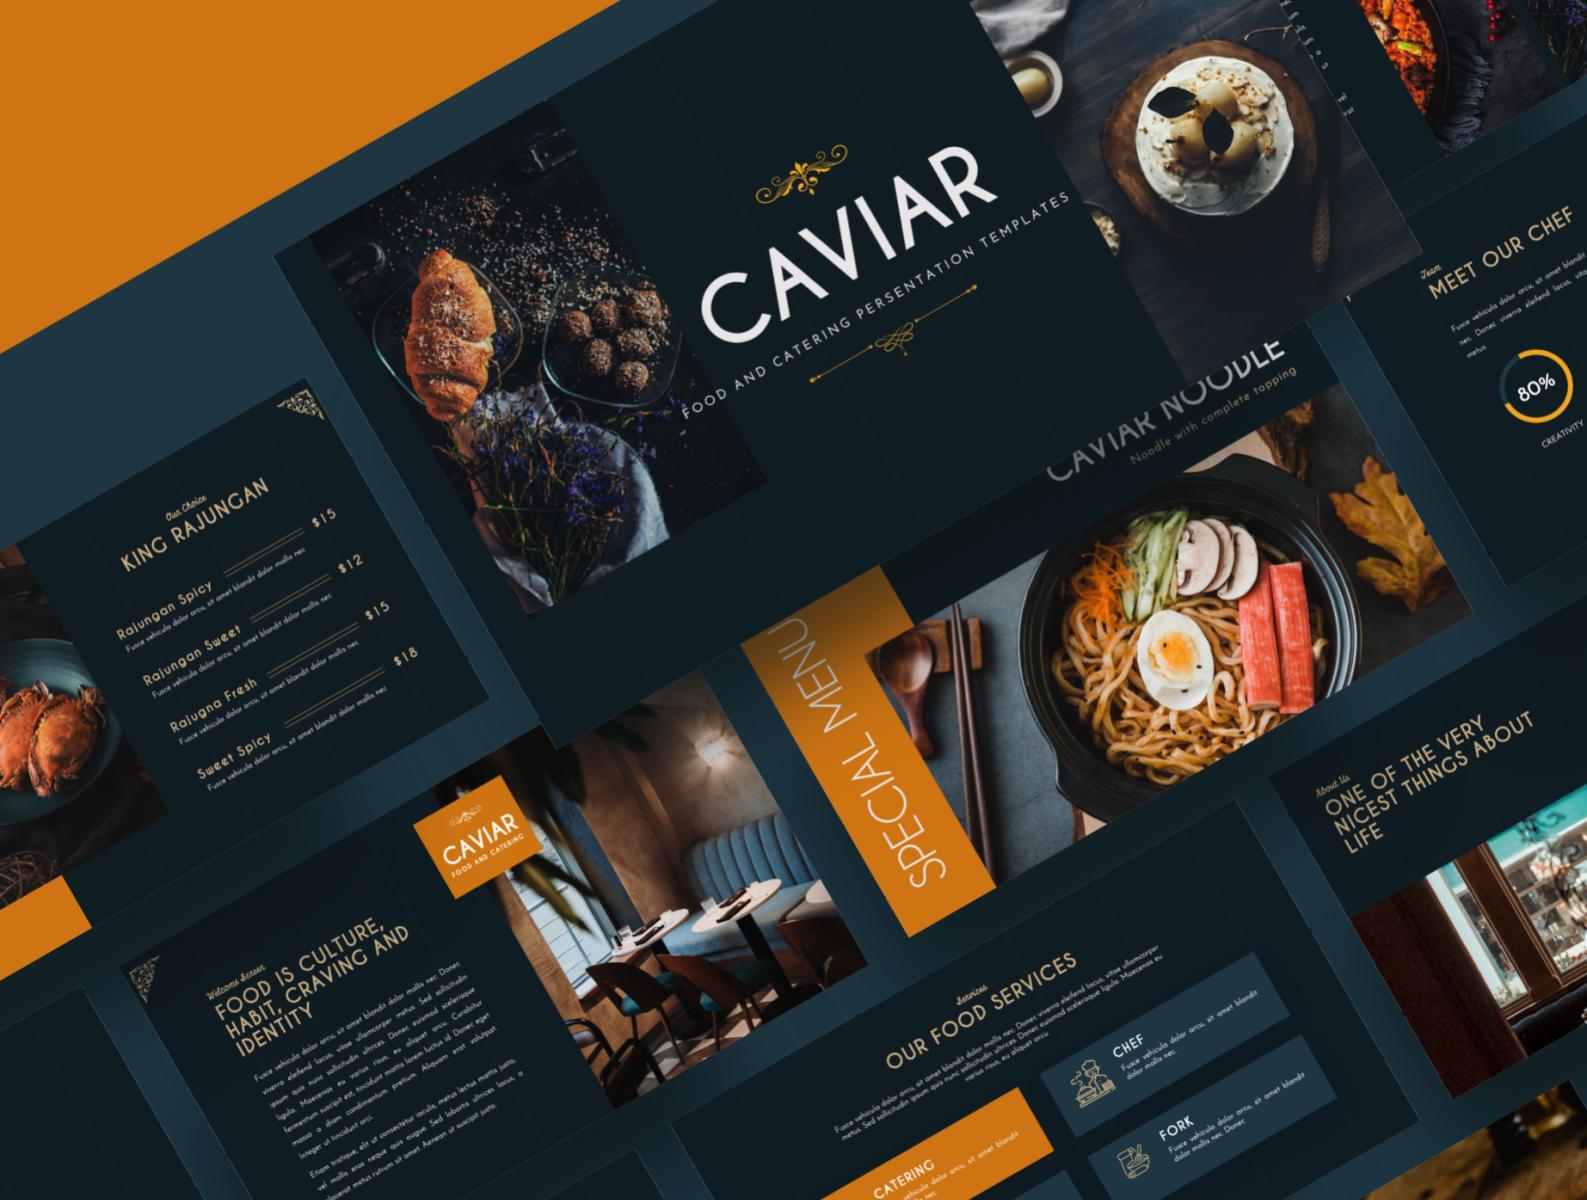 Caviar Catering Food Powerpoint Template By Masdika Studio On Dribbble